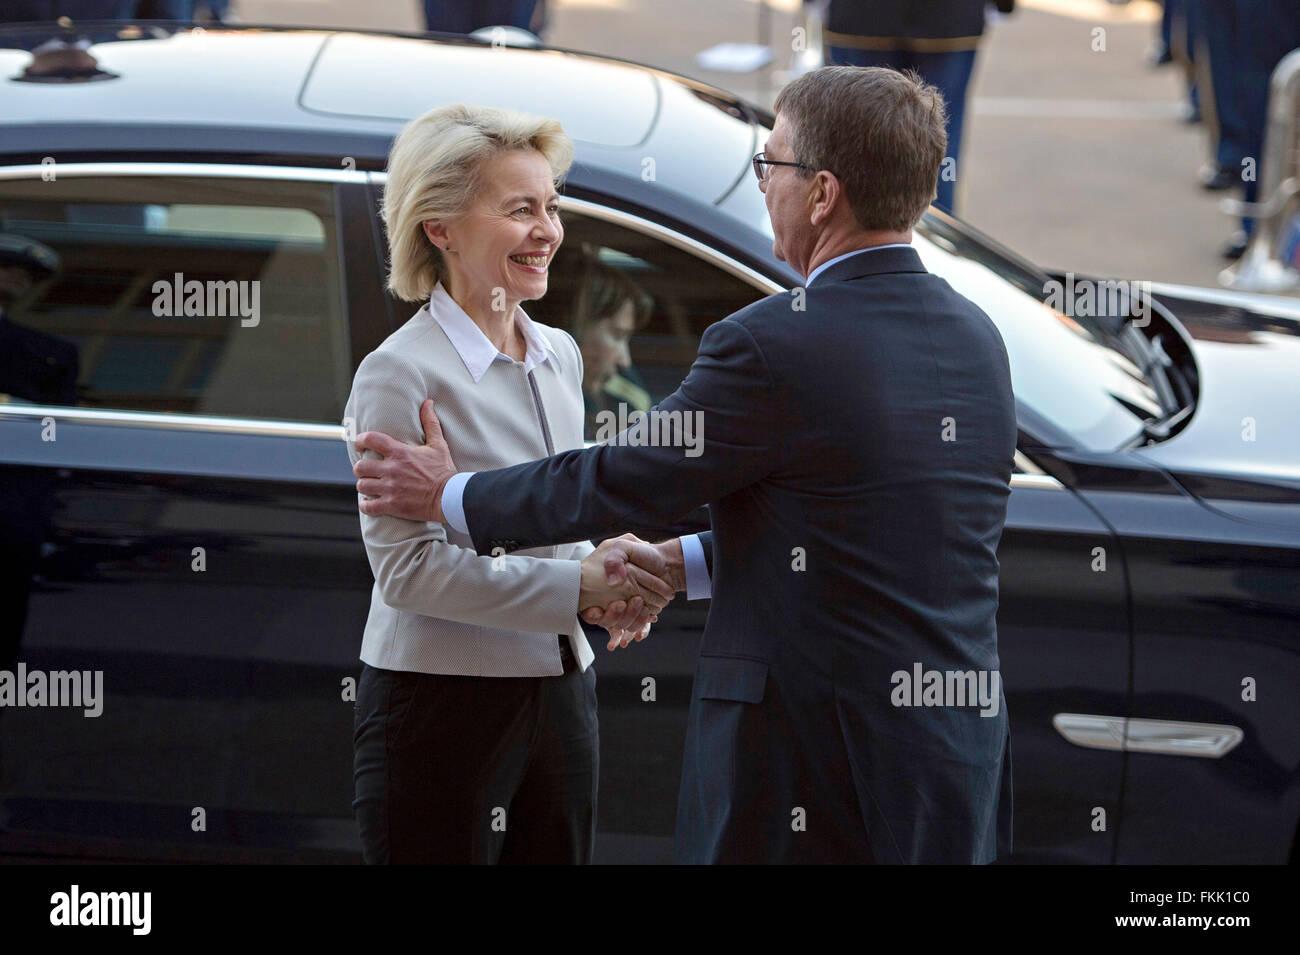 U.S Secretary of Defense Ash Carter welcomes German Minister of Defence Ursula von der Leyen on her arrival at the - Stock Image